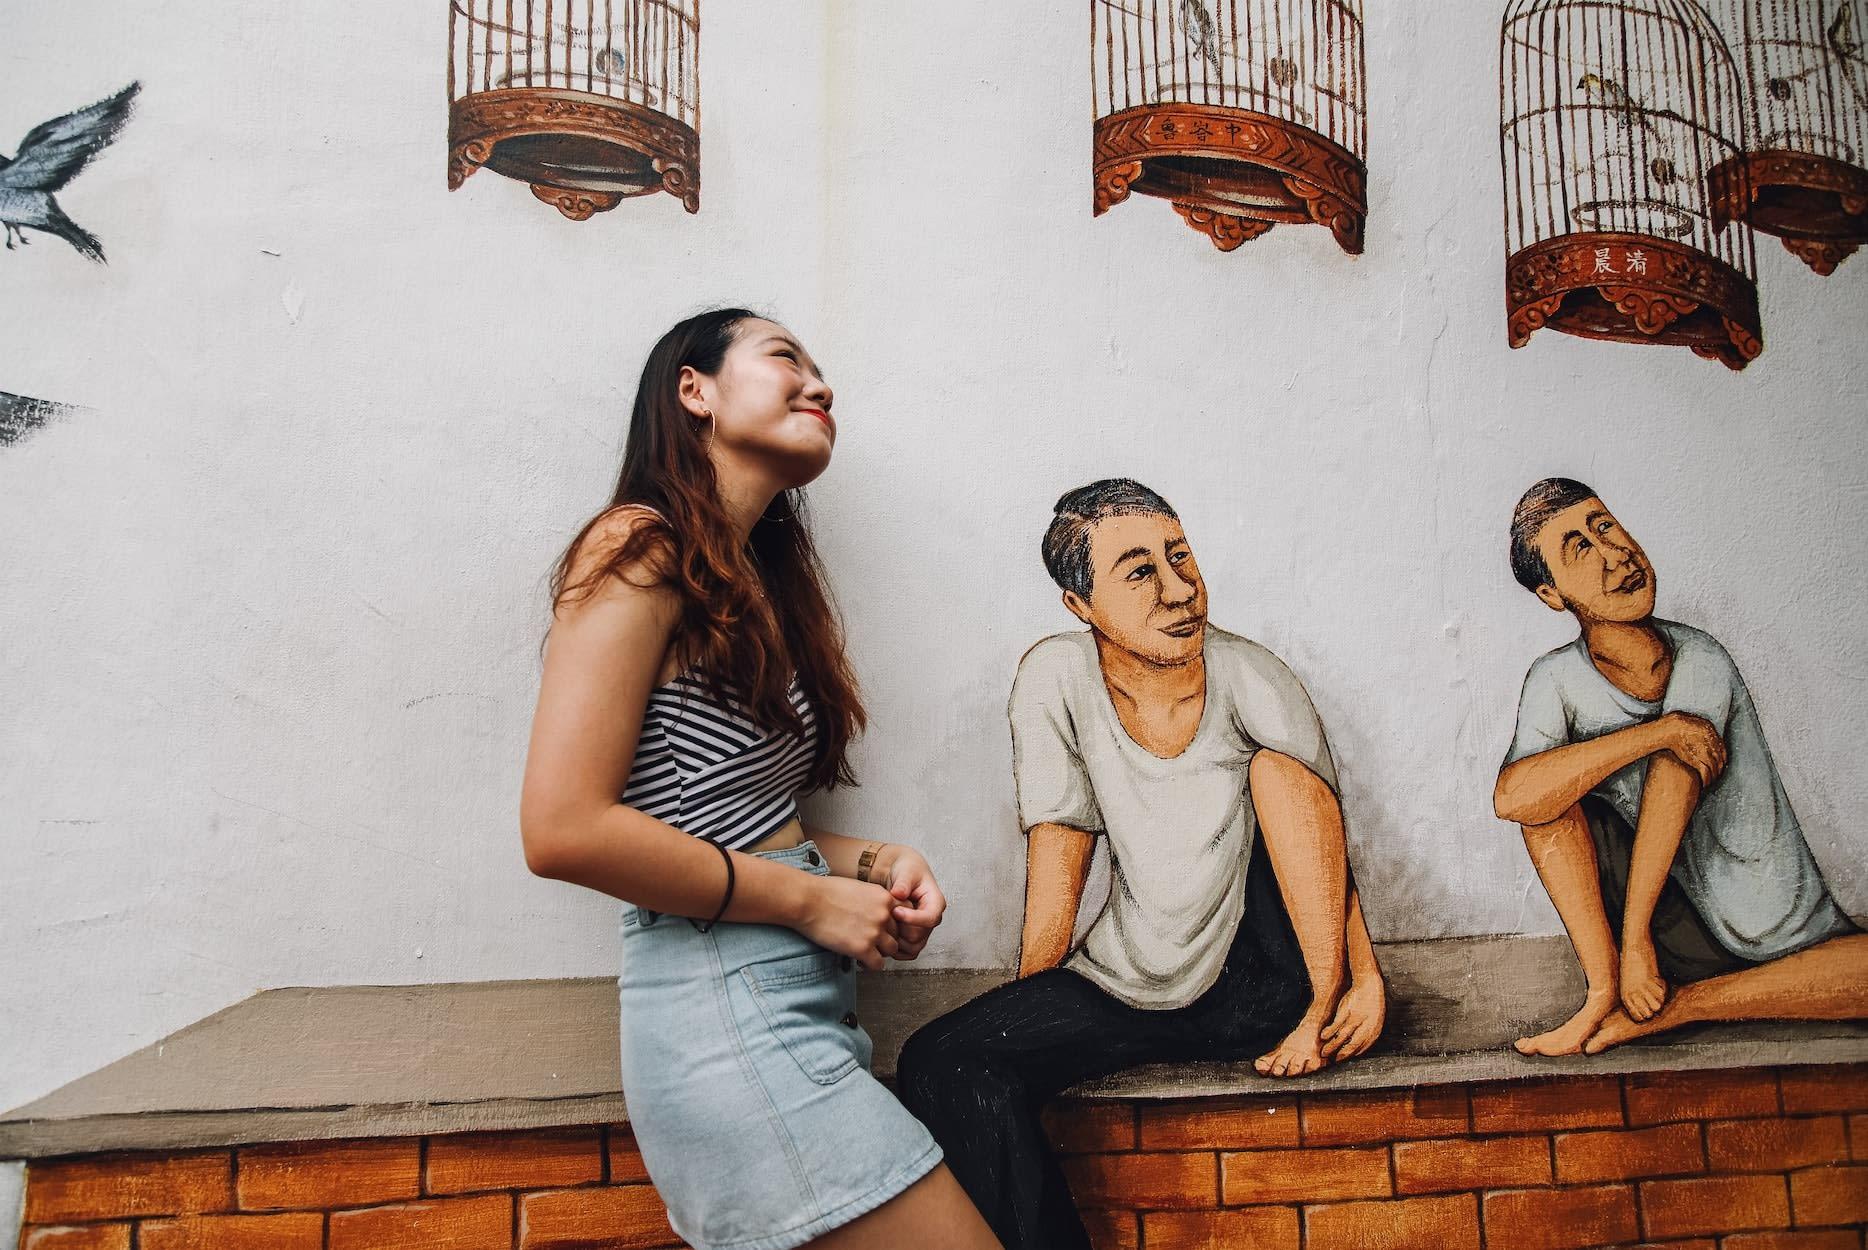 Tiong Bahru murals, singing bird corner